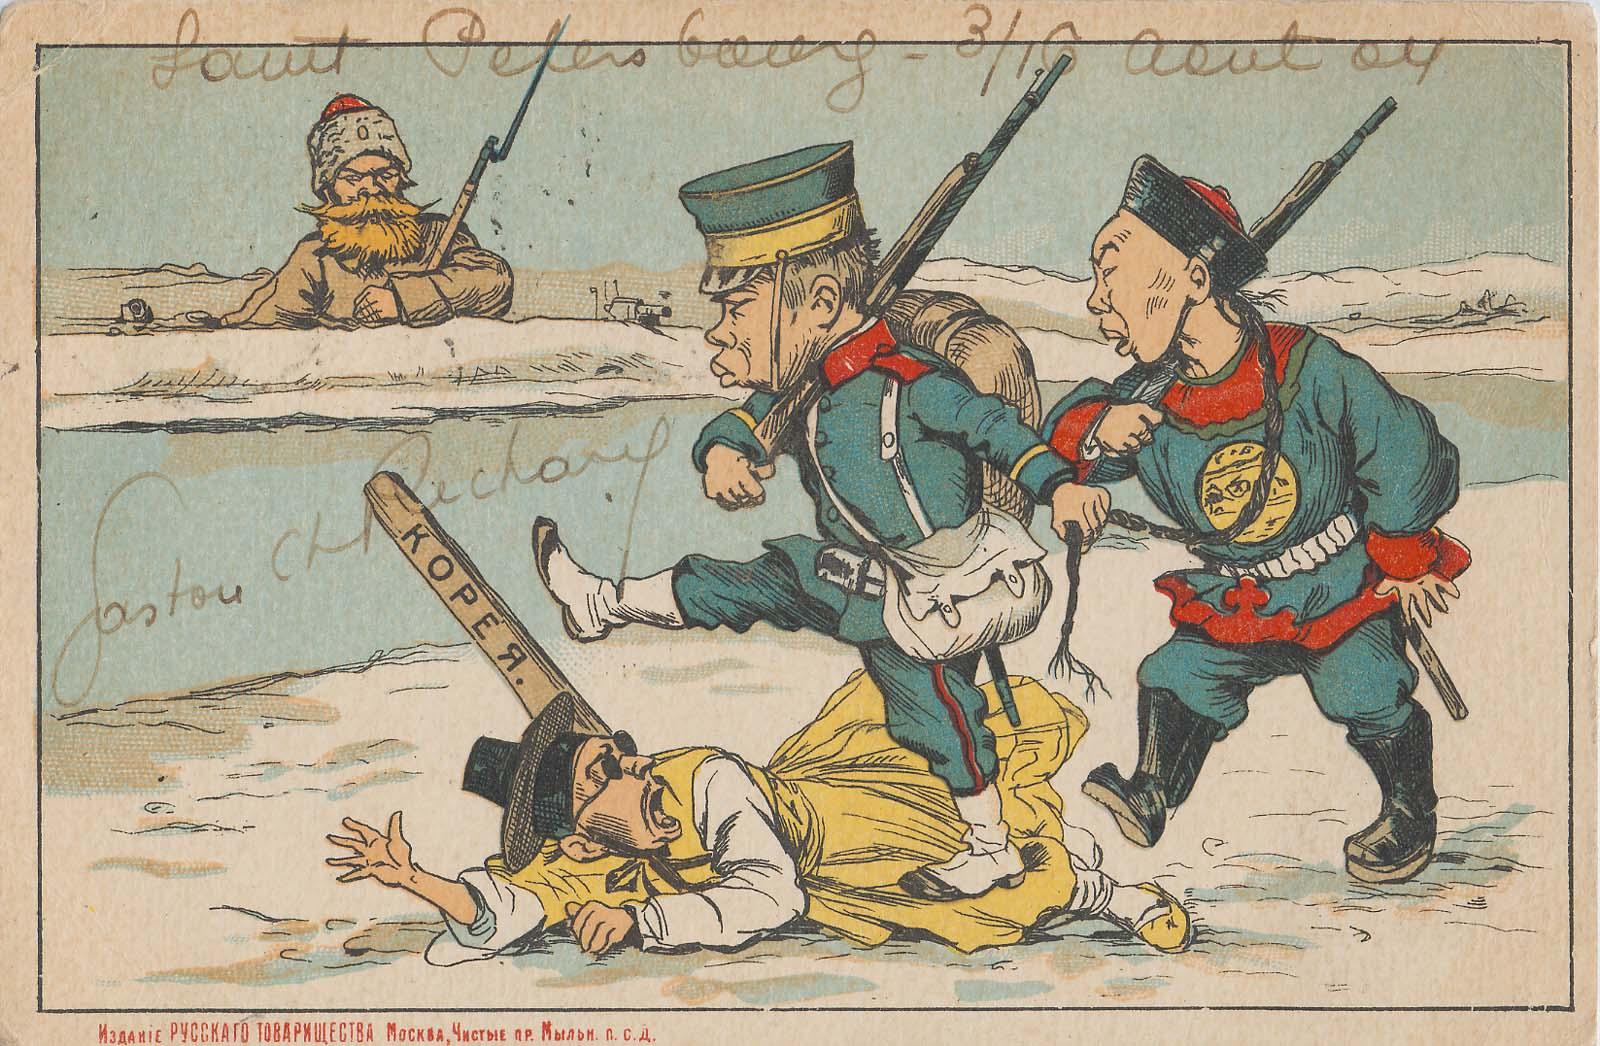 Political Cartoon Of China And Japan Trampling Korea As